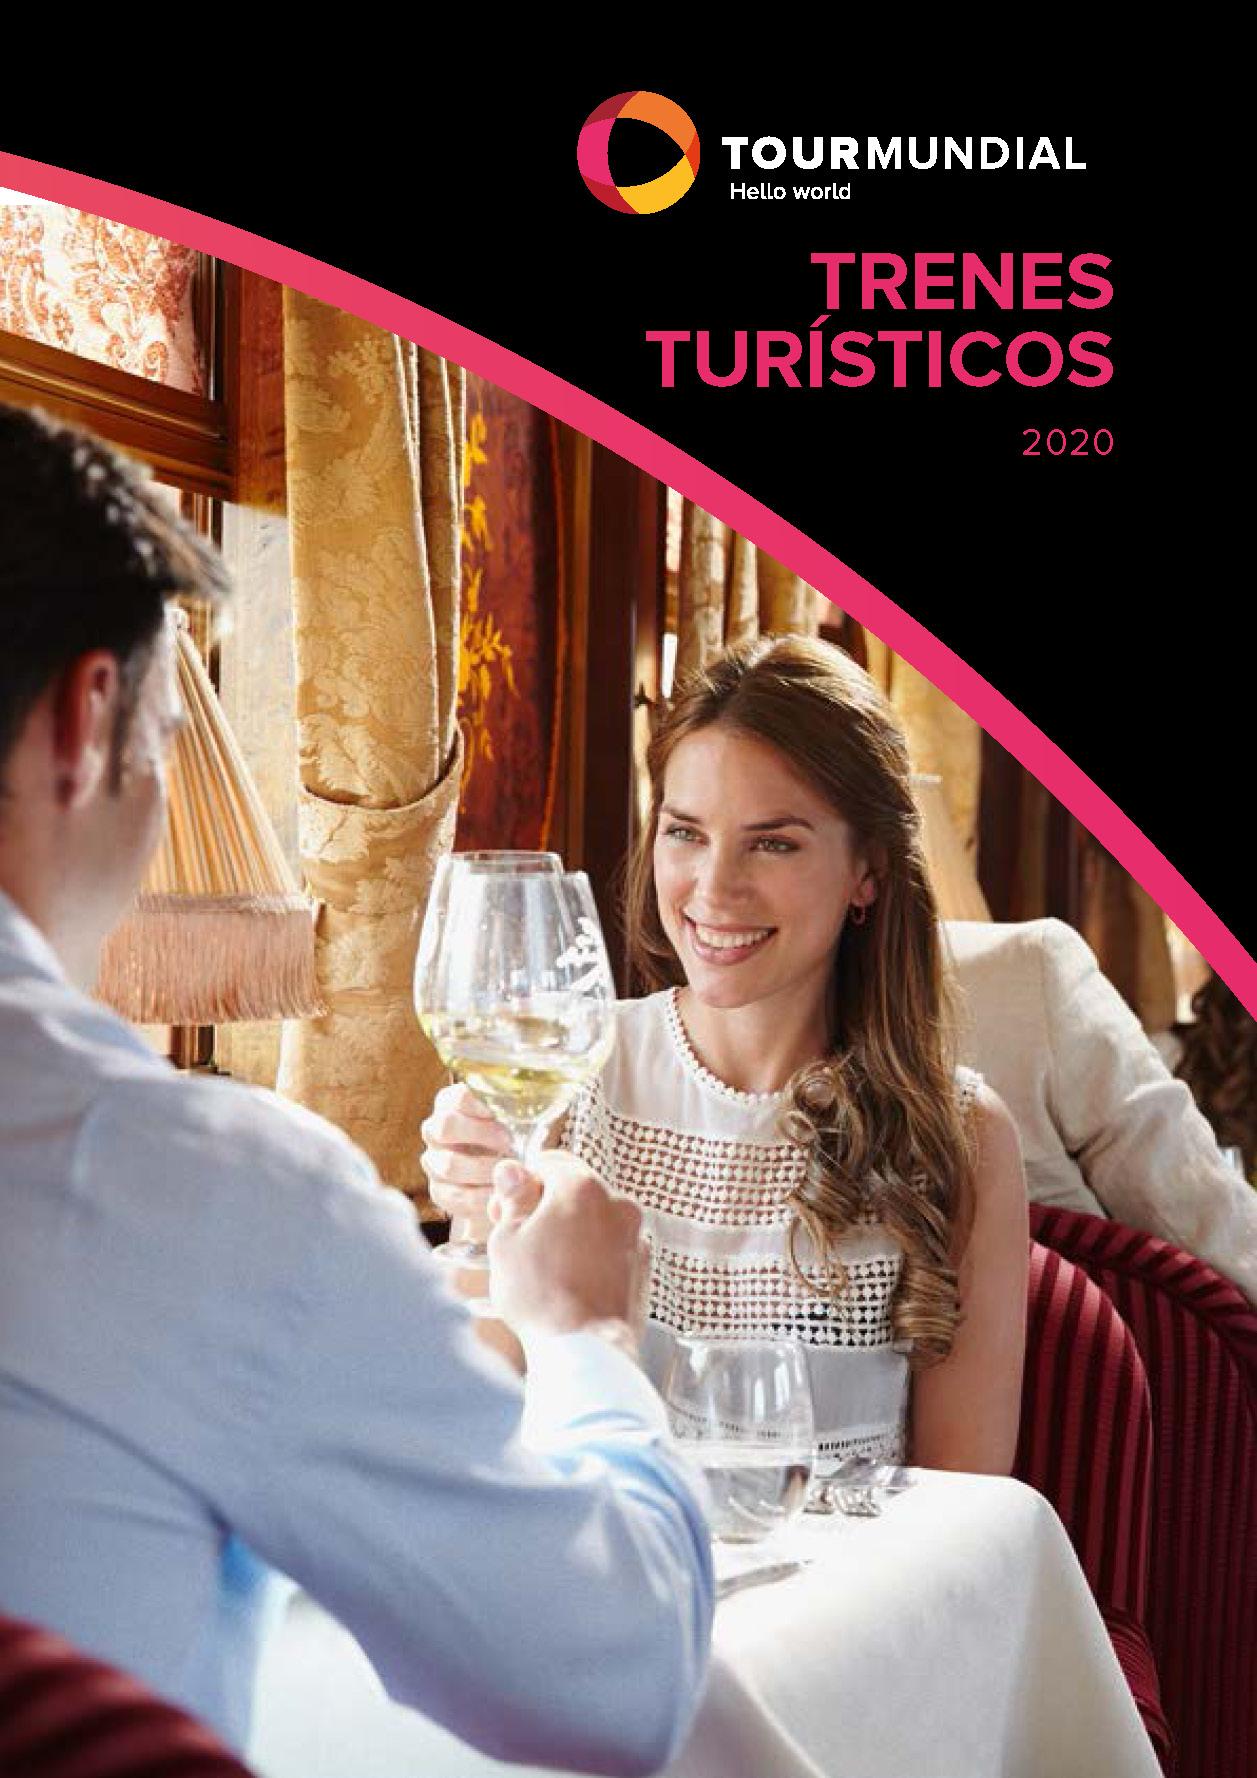 Catalogo Tourmundial Trenes Turísticos de lujo 2020